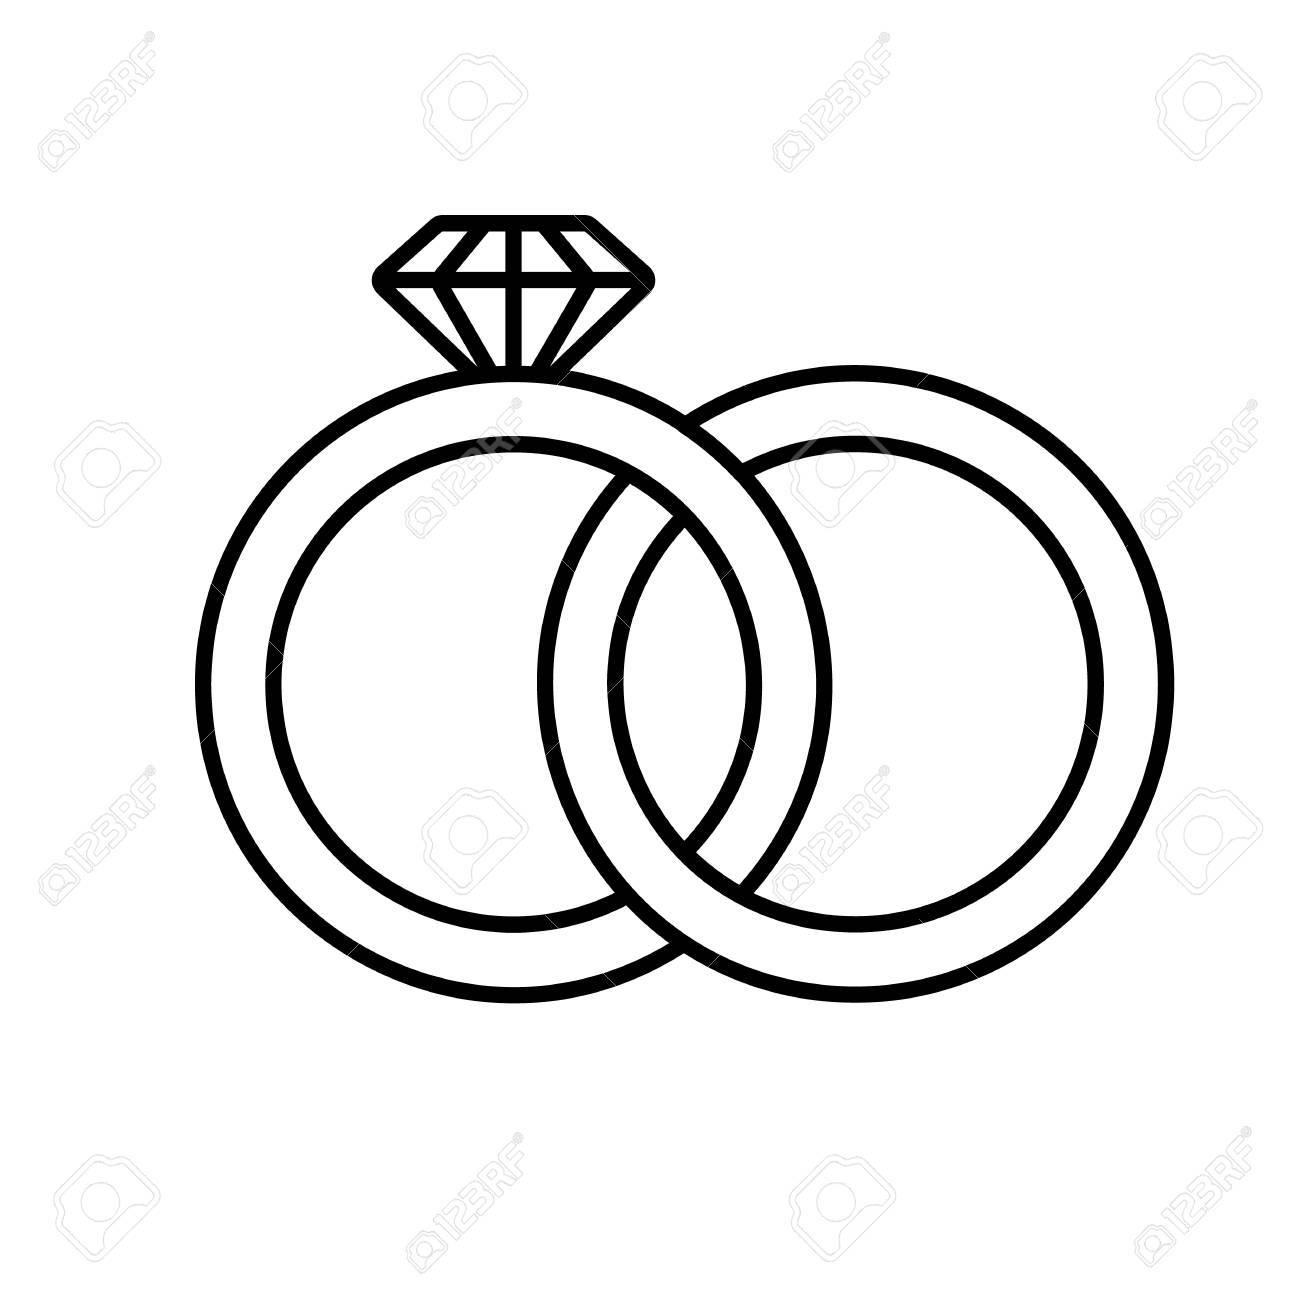 Wedding rings linear icon. Thin line illustration. Interlocked...